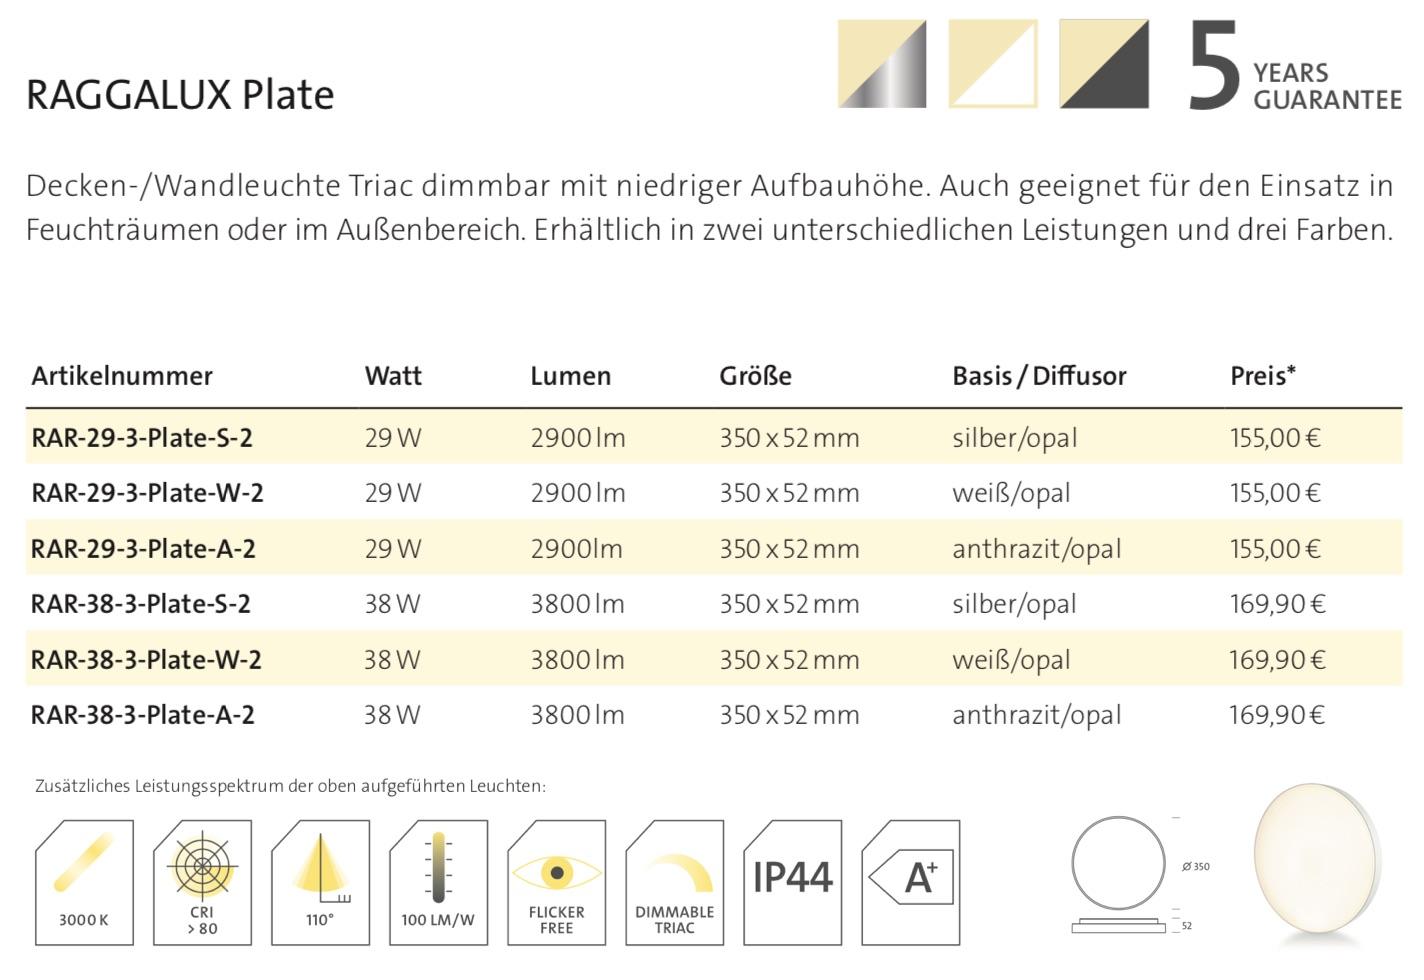 Raggalux Plate Datenblatt